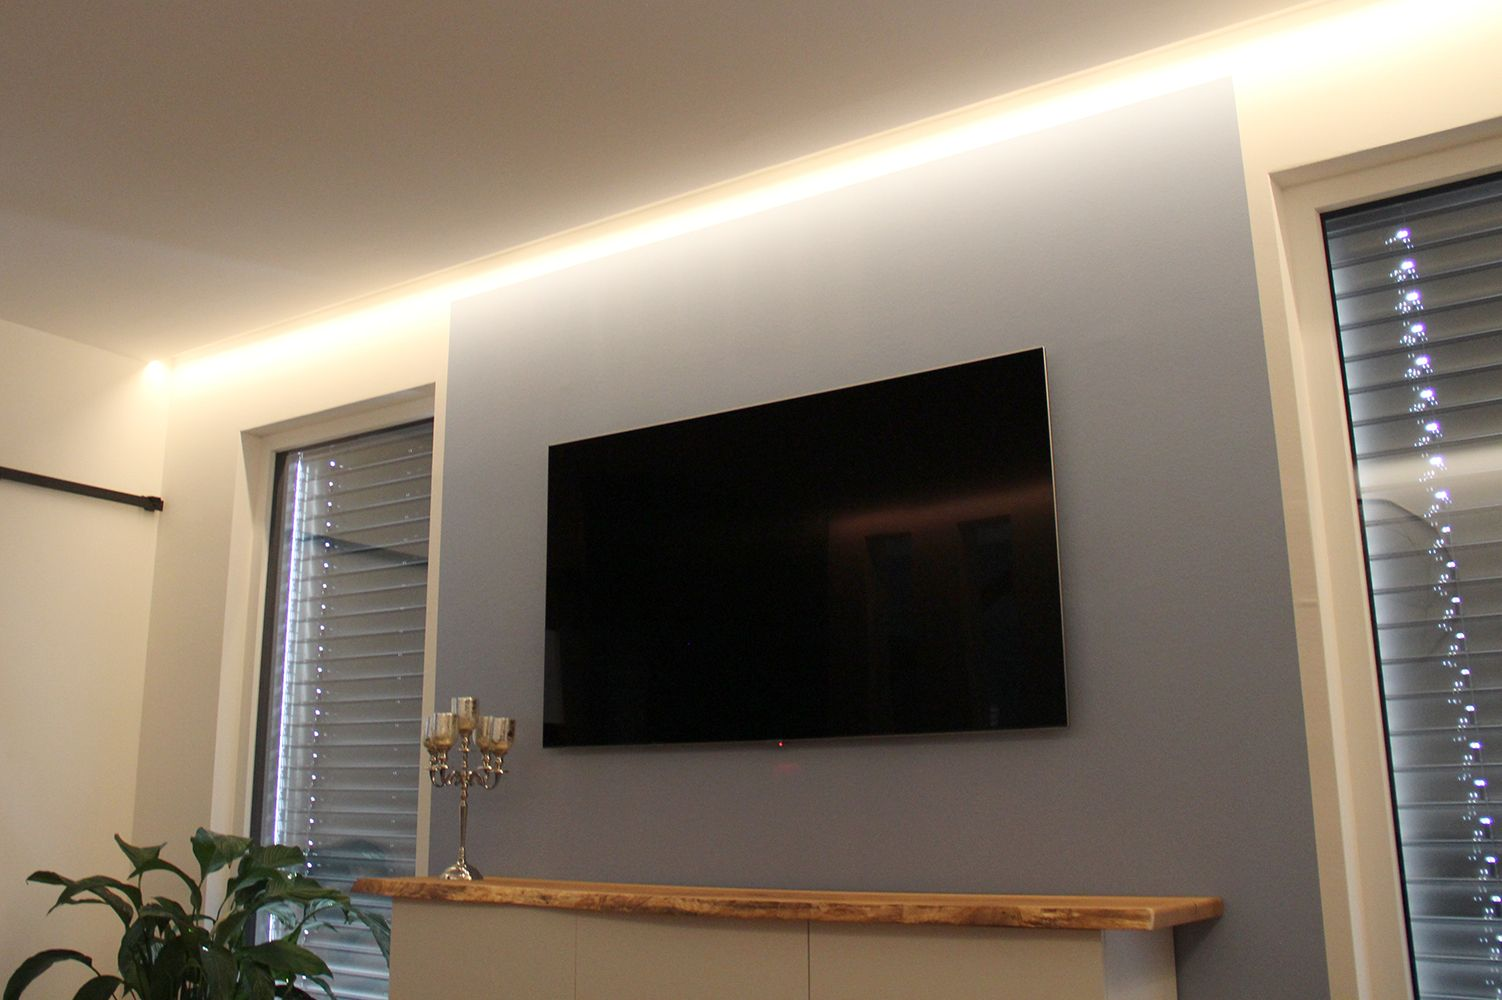 Led Strip Furs Wohnzimmer In 2020 Wohnzimmerbeleuchtung Led Stripes Moderne Beleuchtung